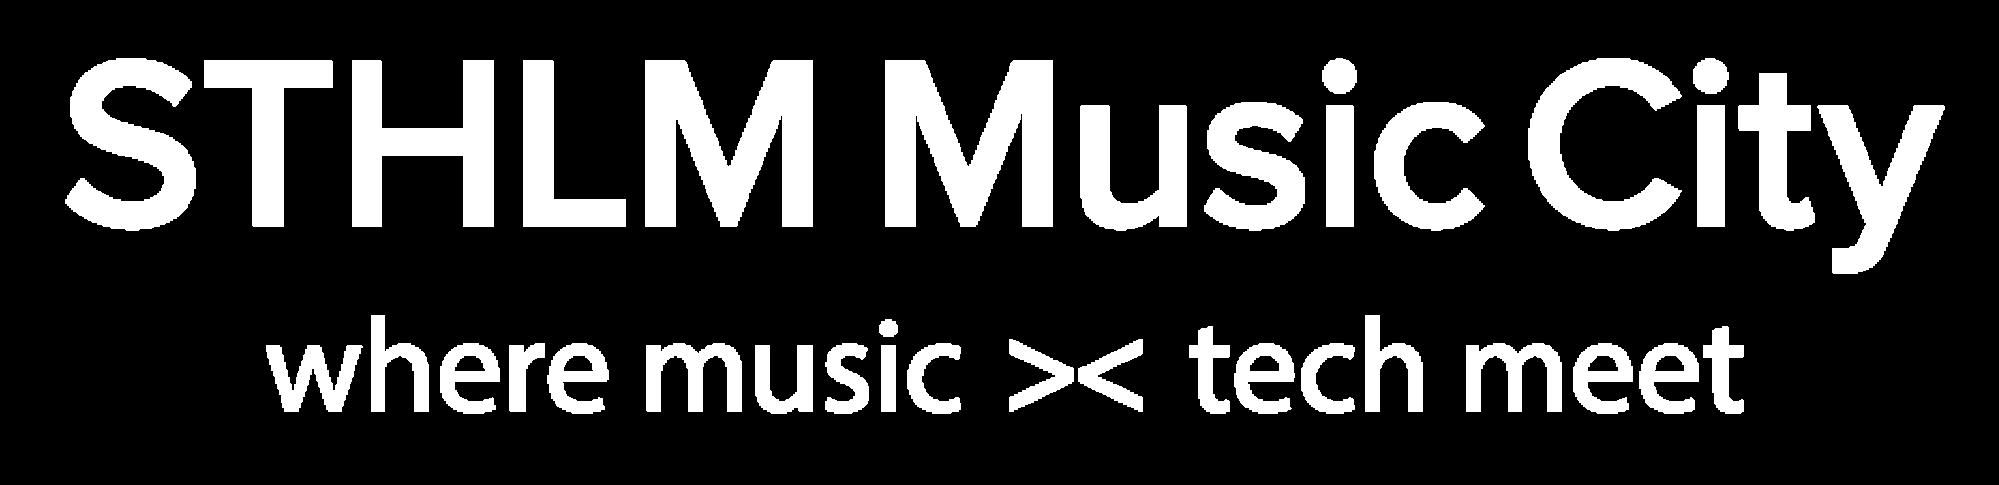 Stockholm Music City